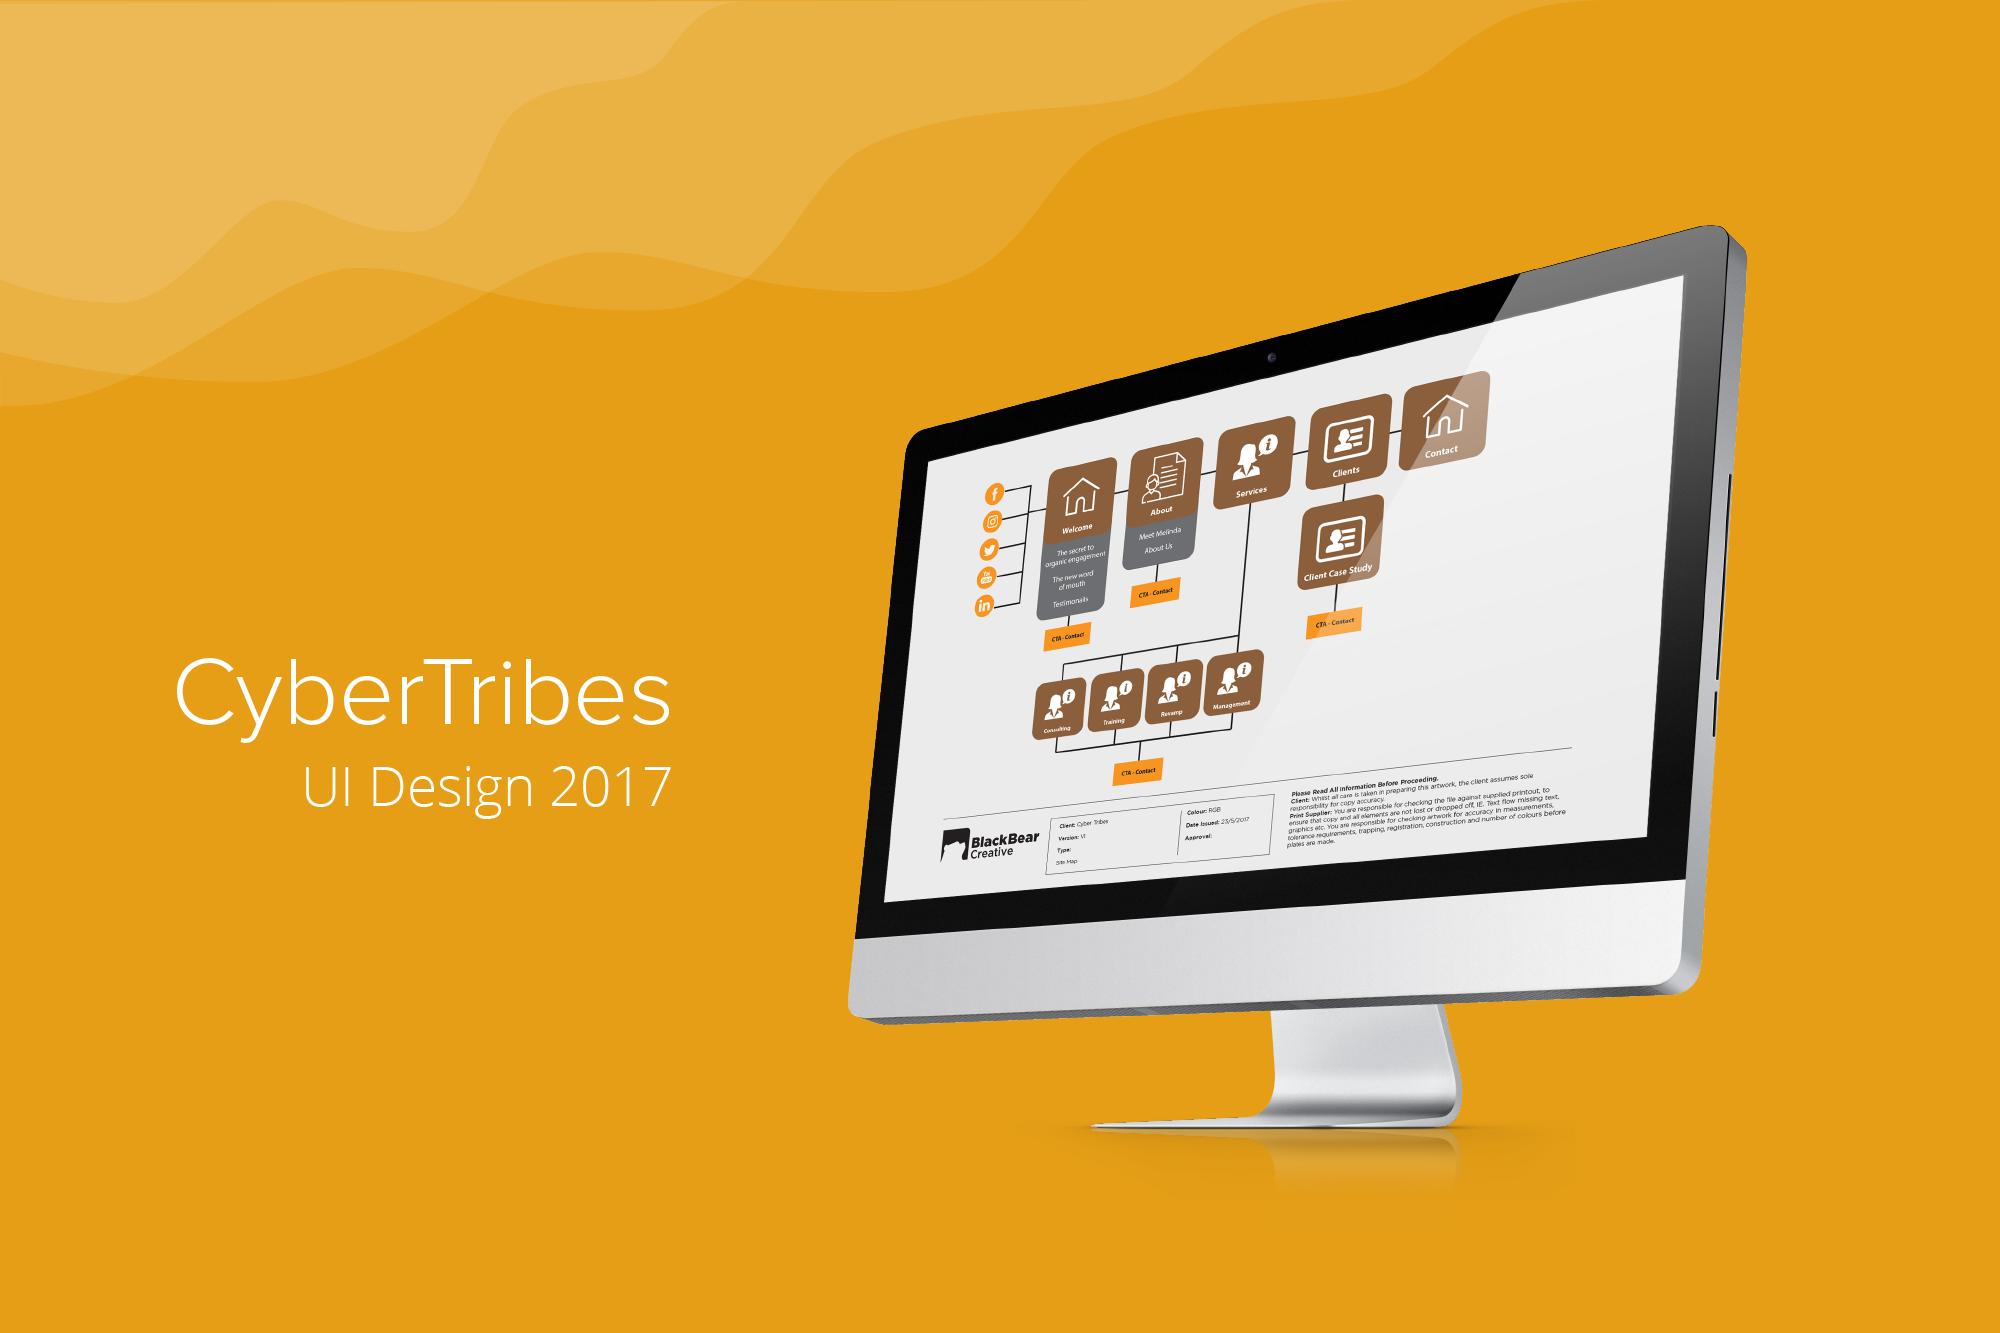 CyberTribes UI Design 1